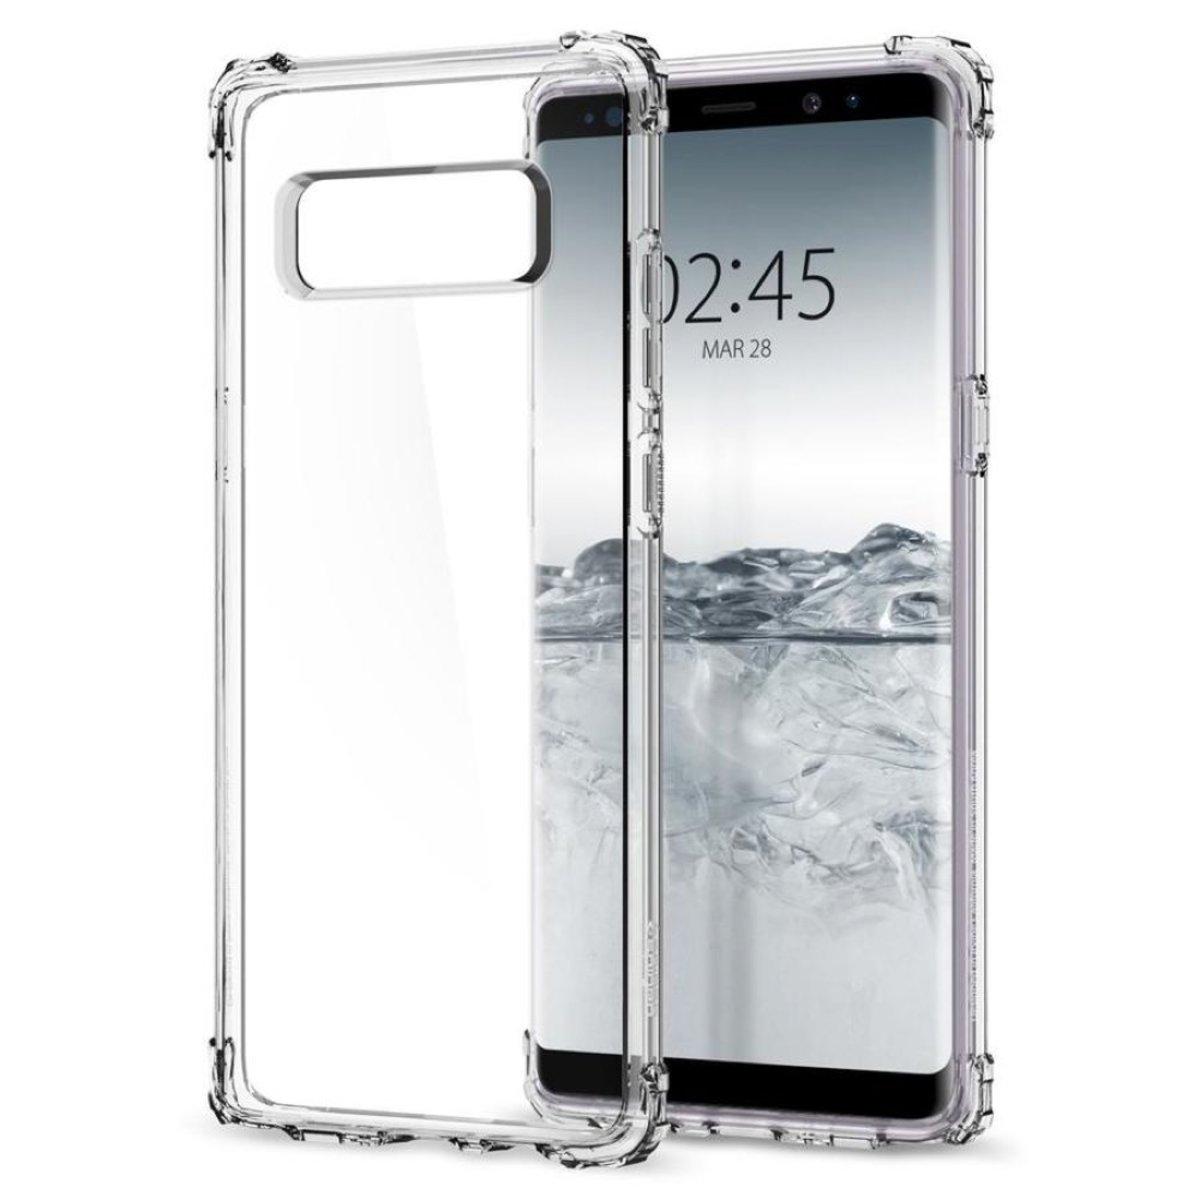 Galaxy Note 8 Crystal Shell 保護殼 - 晶透